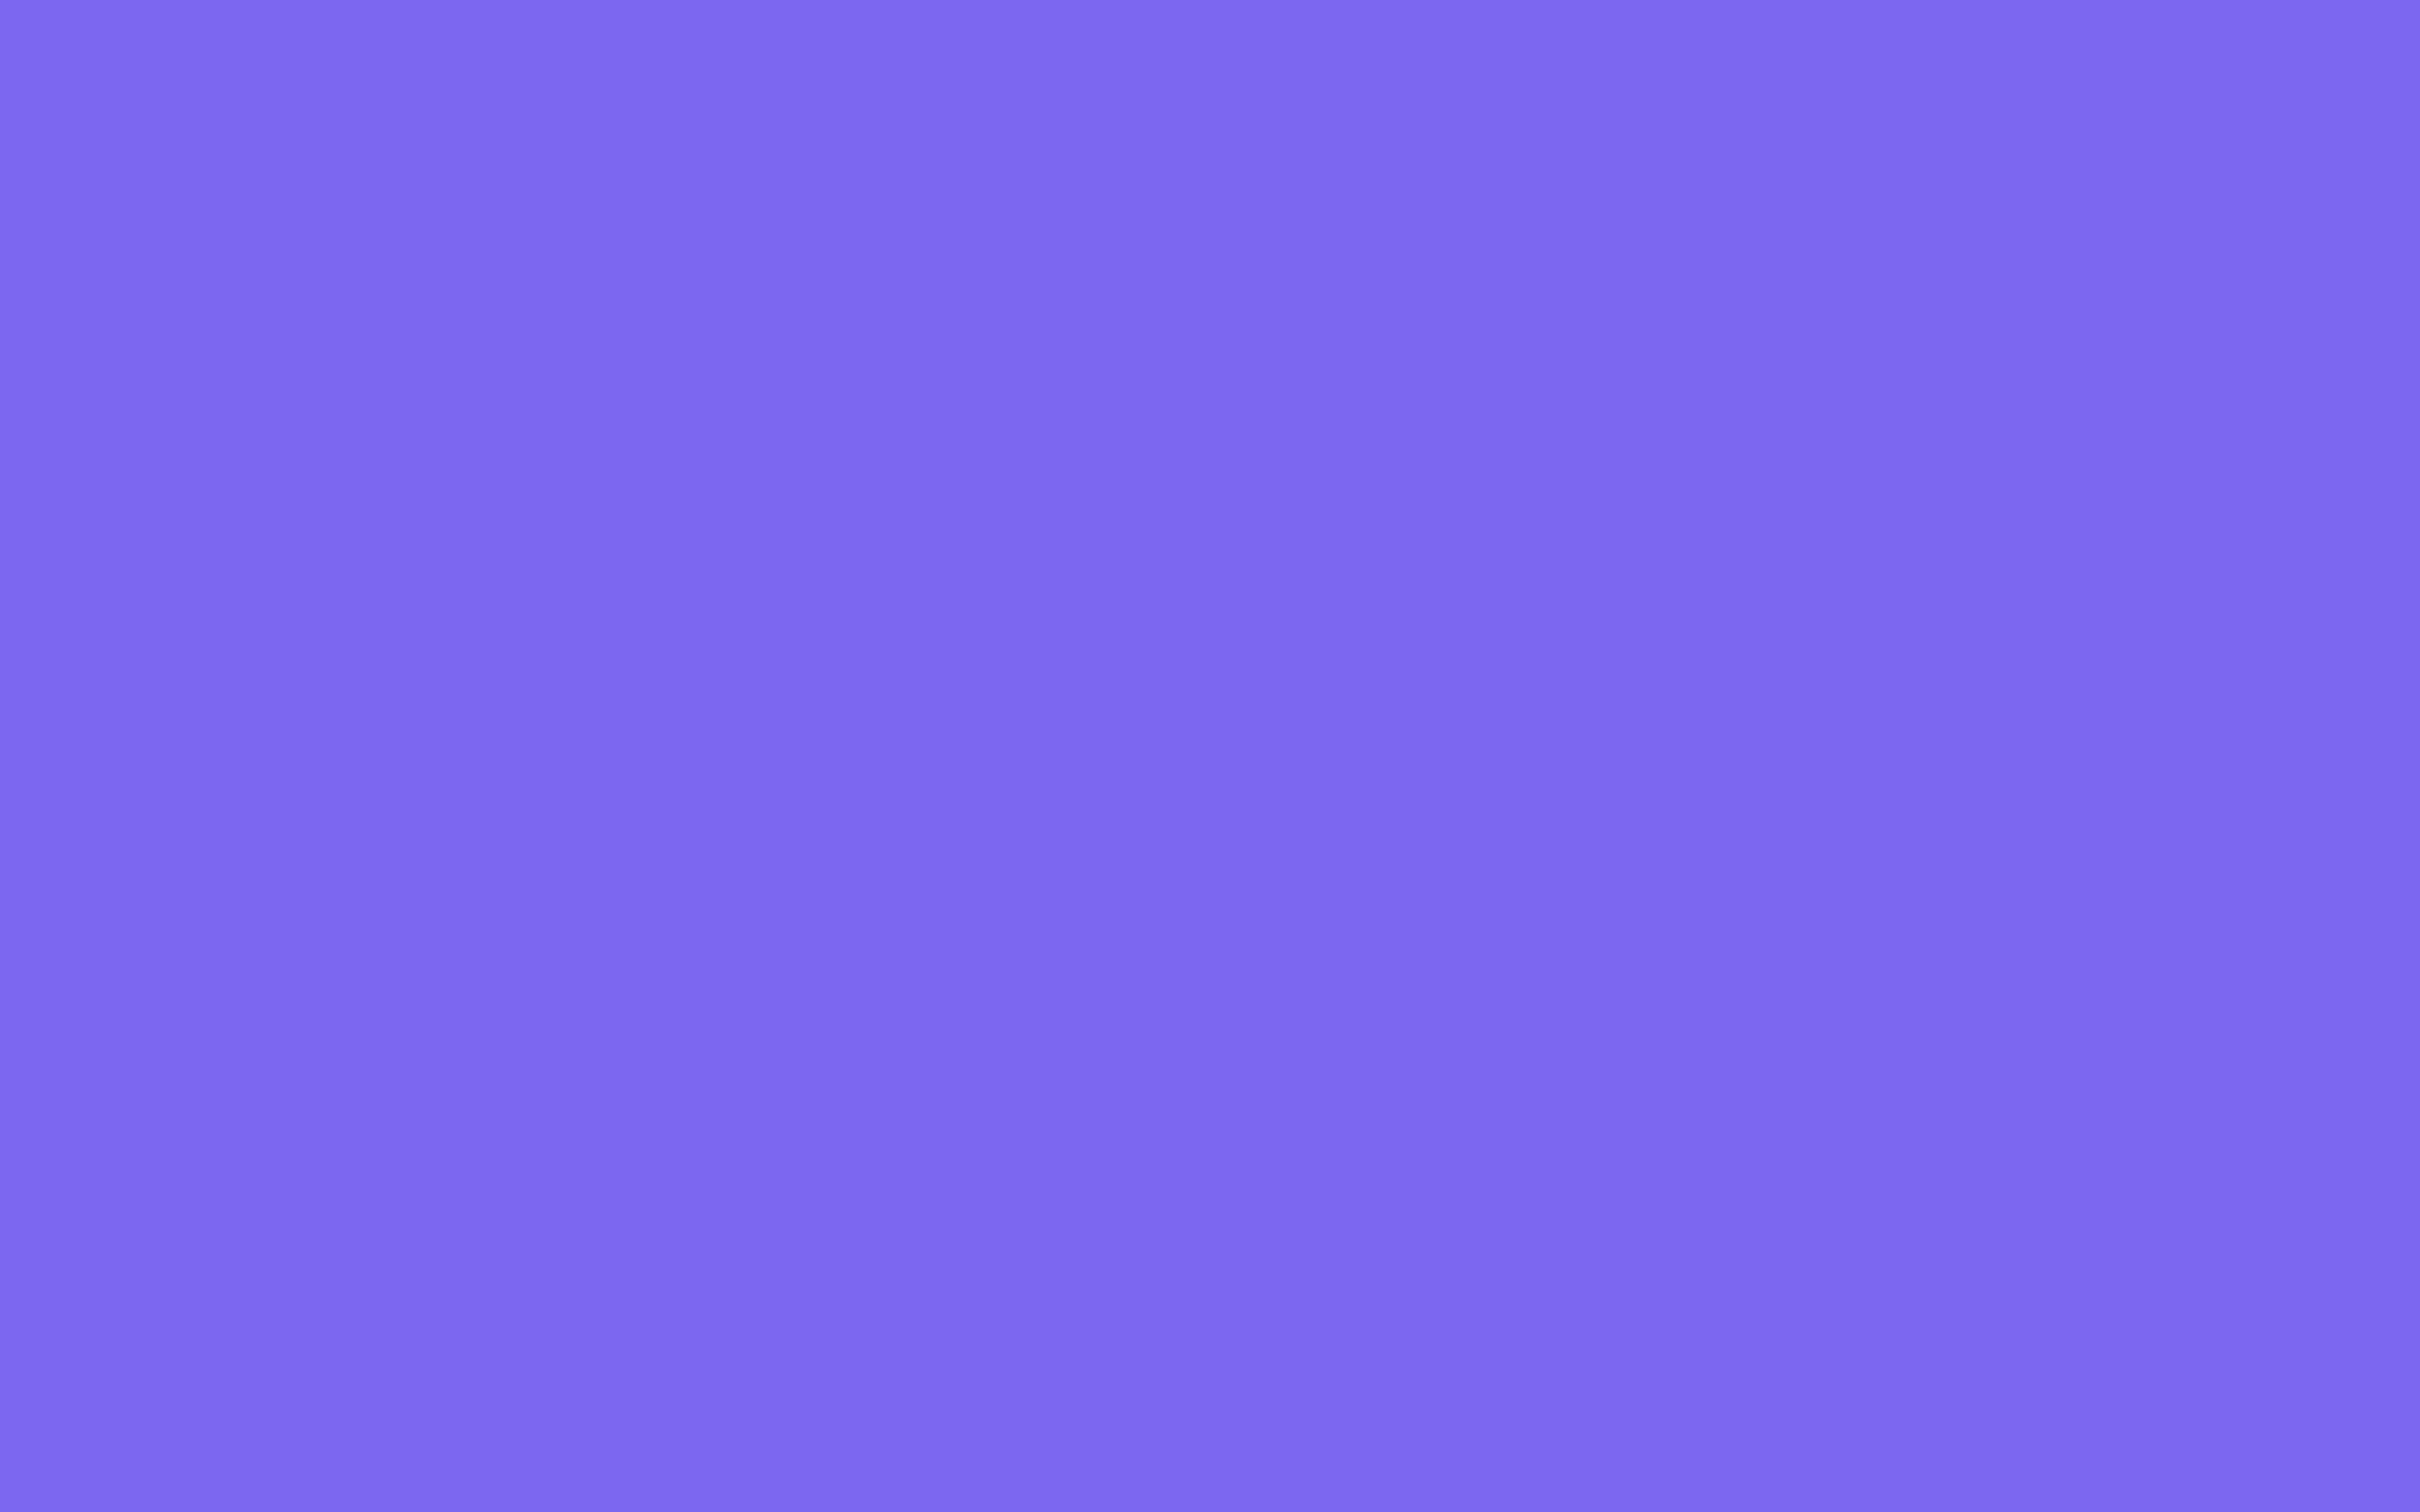 2560x1600 Medium Slate Blue Solid Color Background